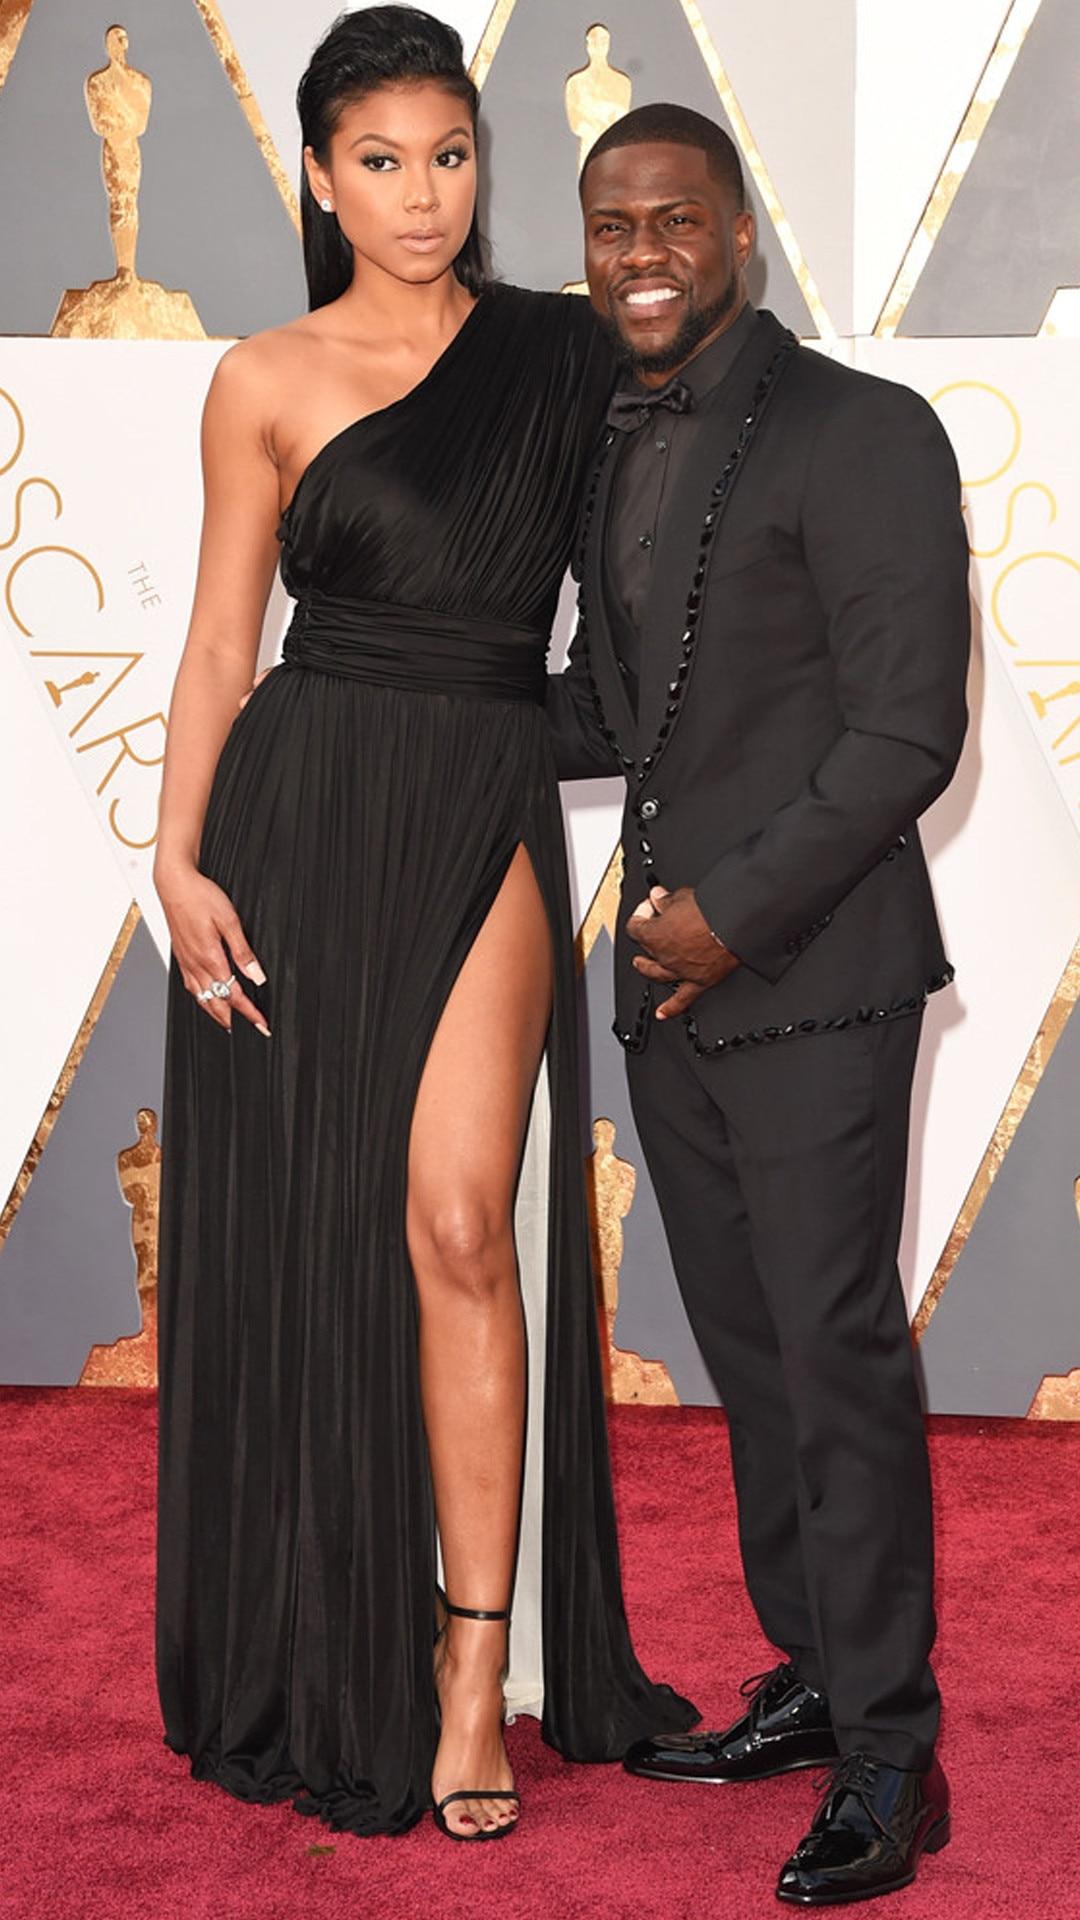 2016 Oscars, Academy Awards, Arrivals, Kevin Hart, Eniko Parrish, Couples